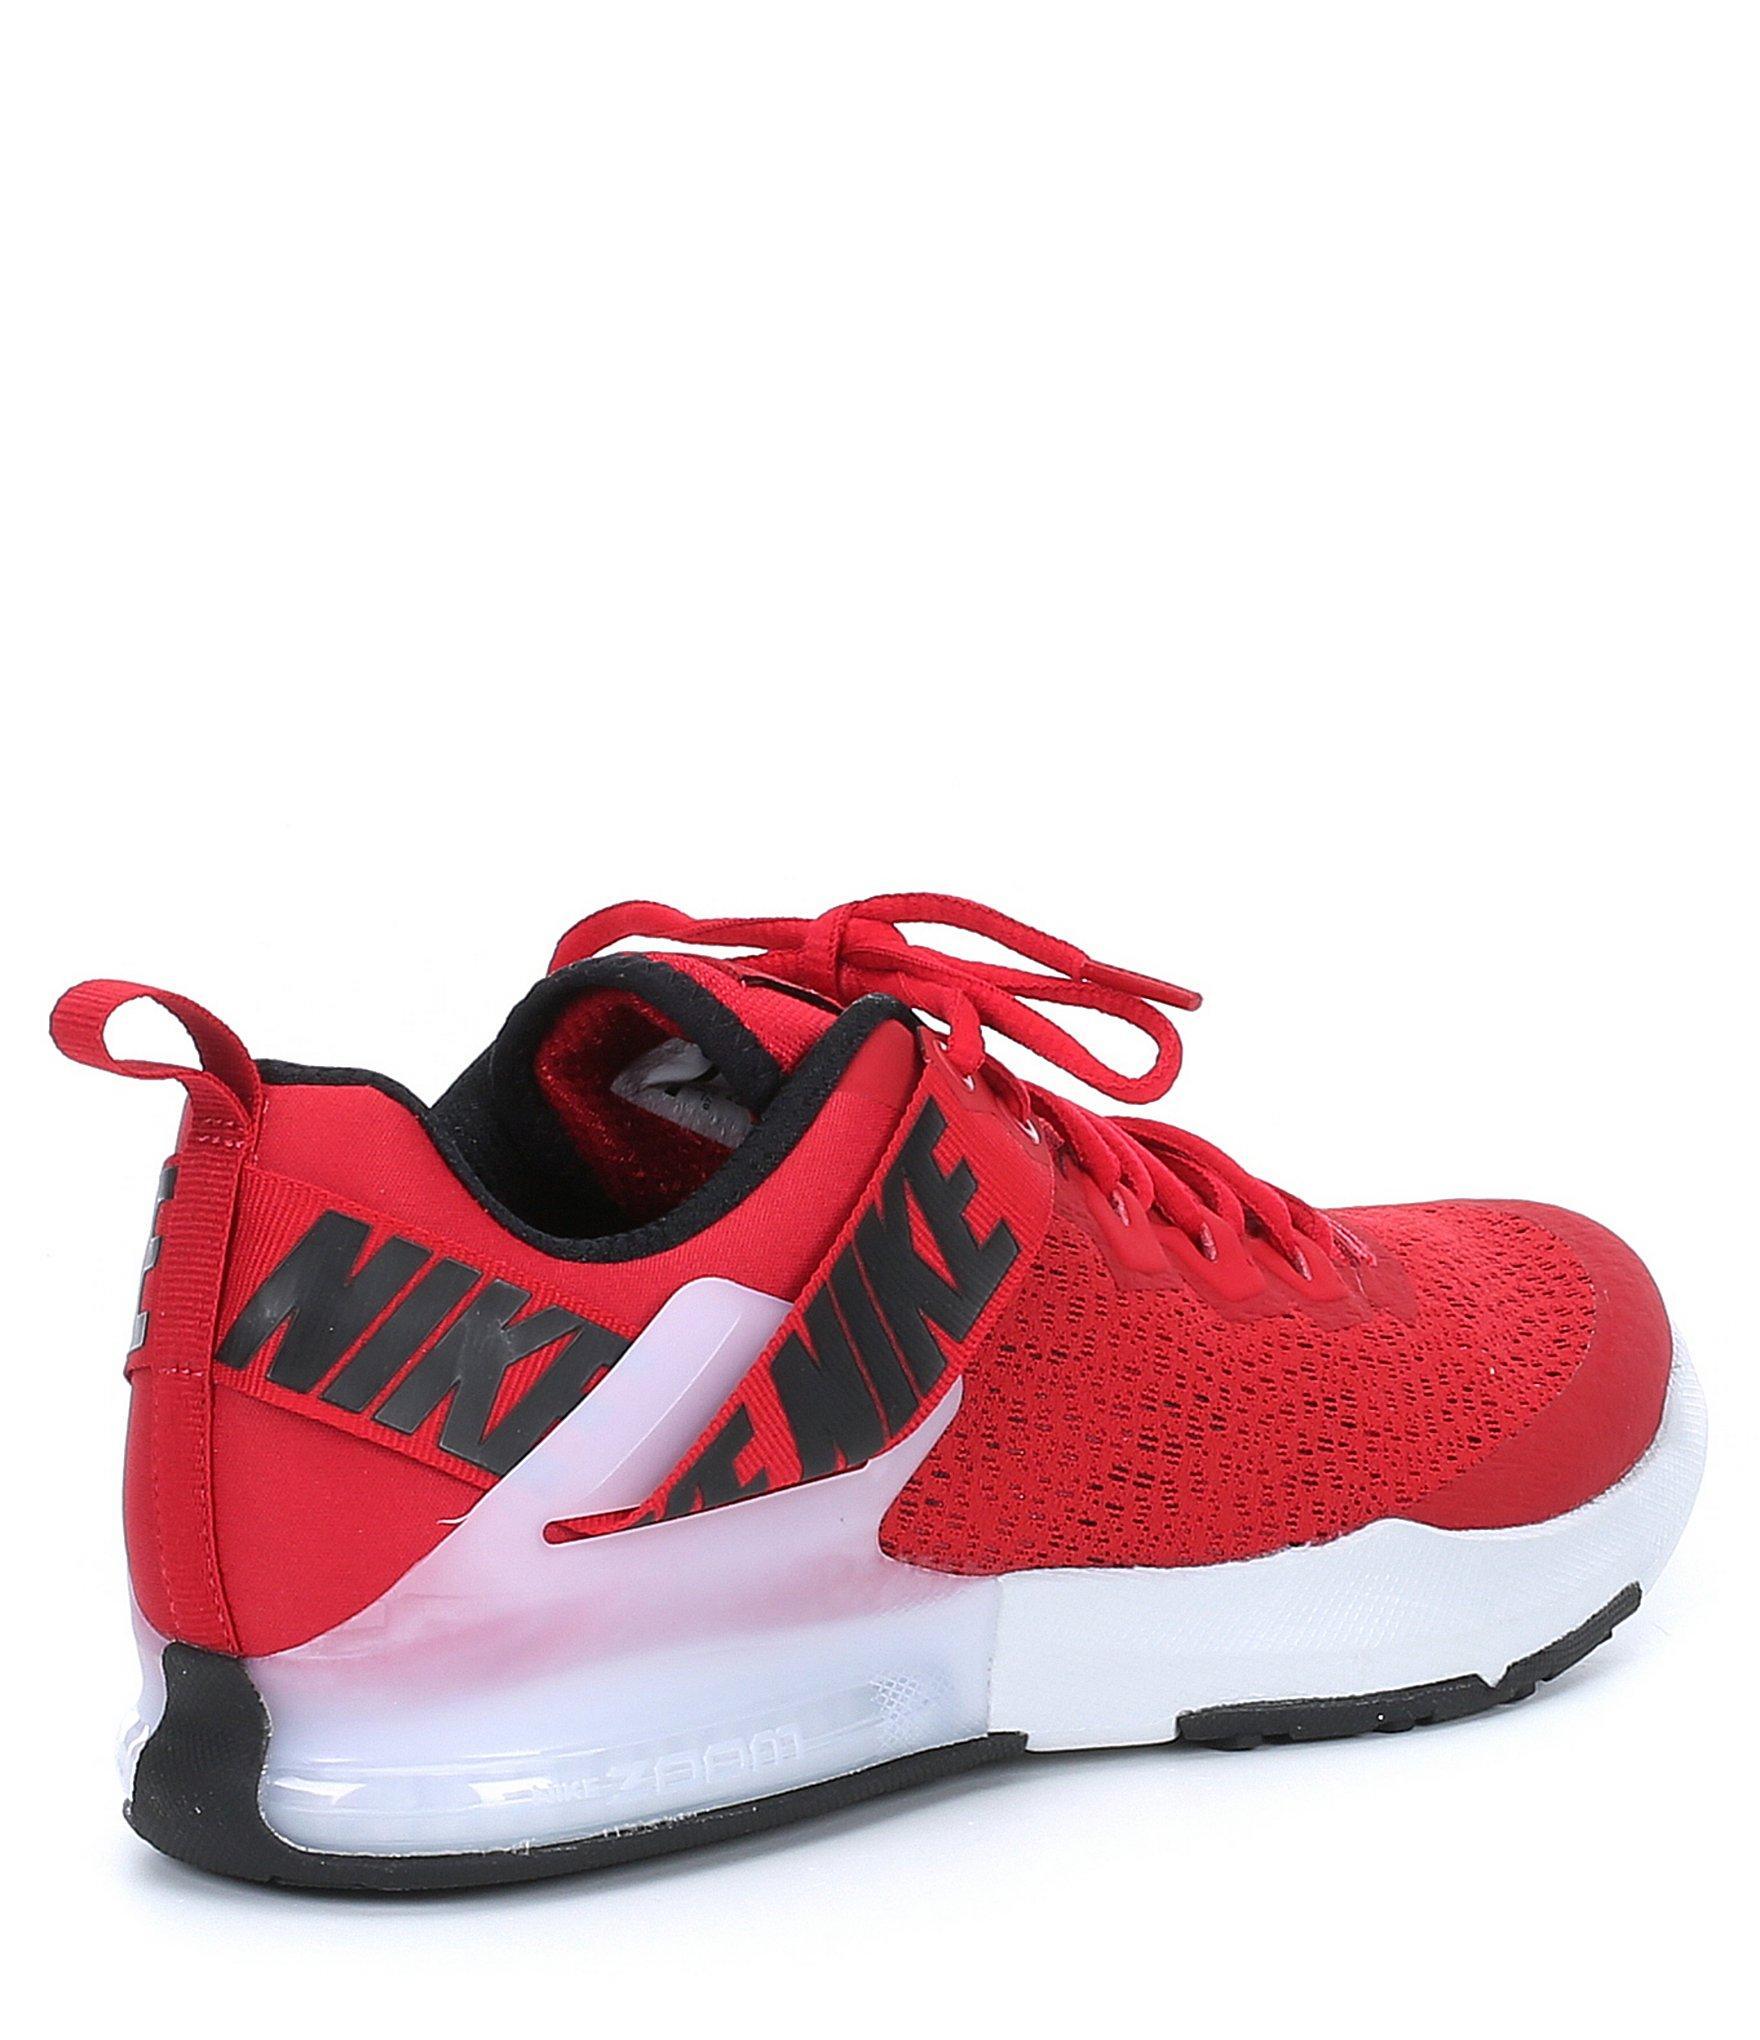 d824d2195ba6c Lyst - Nike Men s Zoom Domination Tr 2 Training Shoe in Red for Men